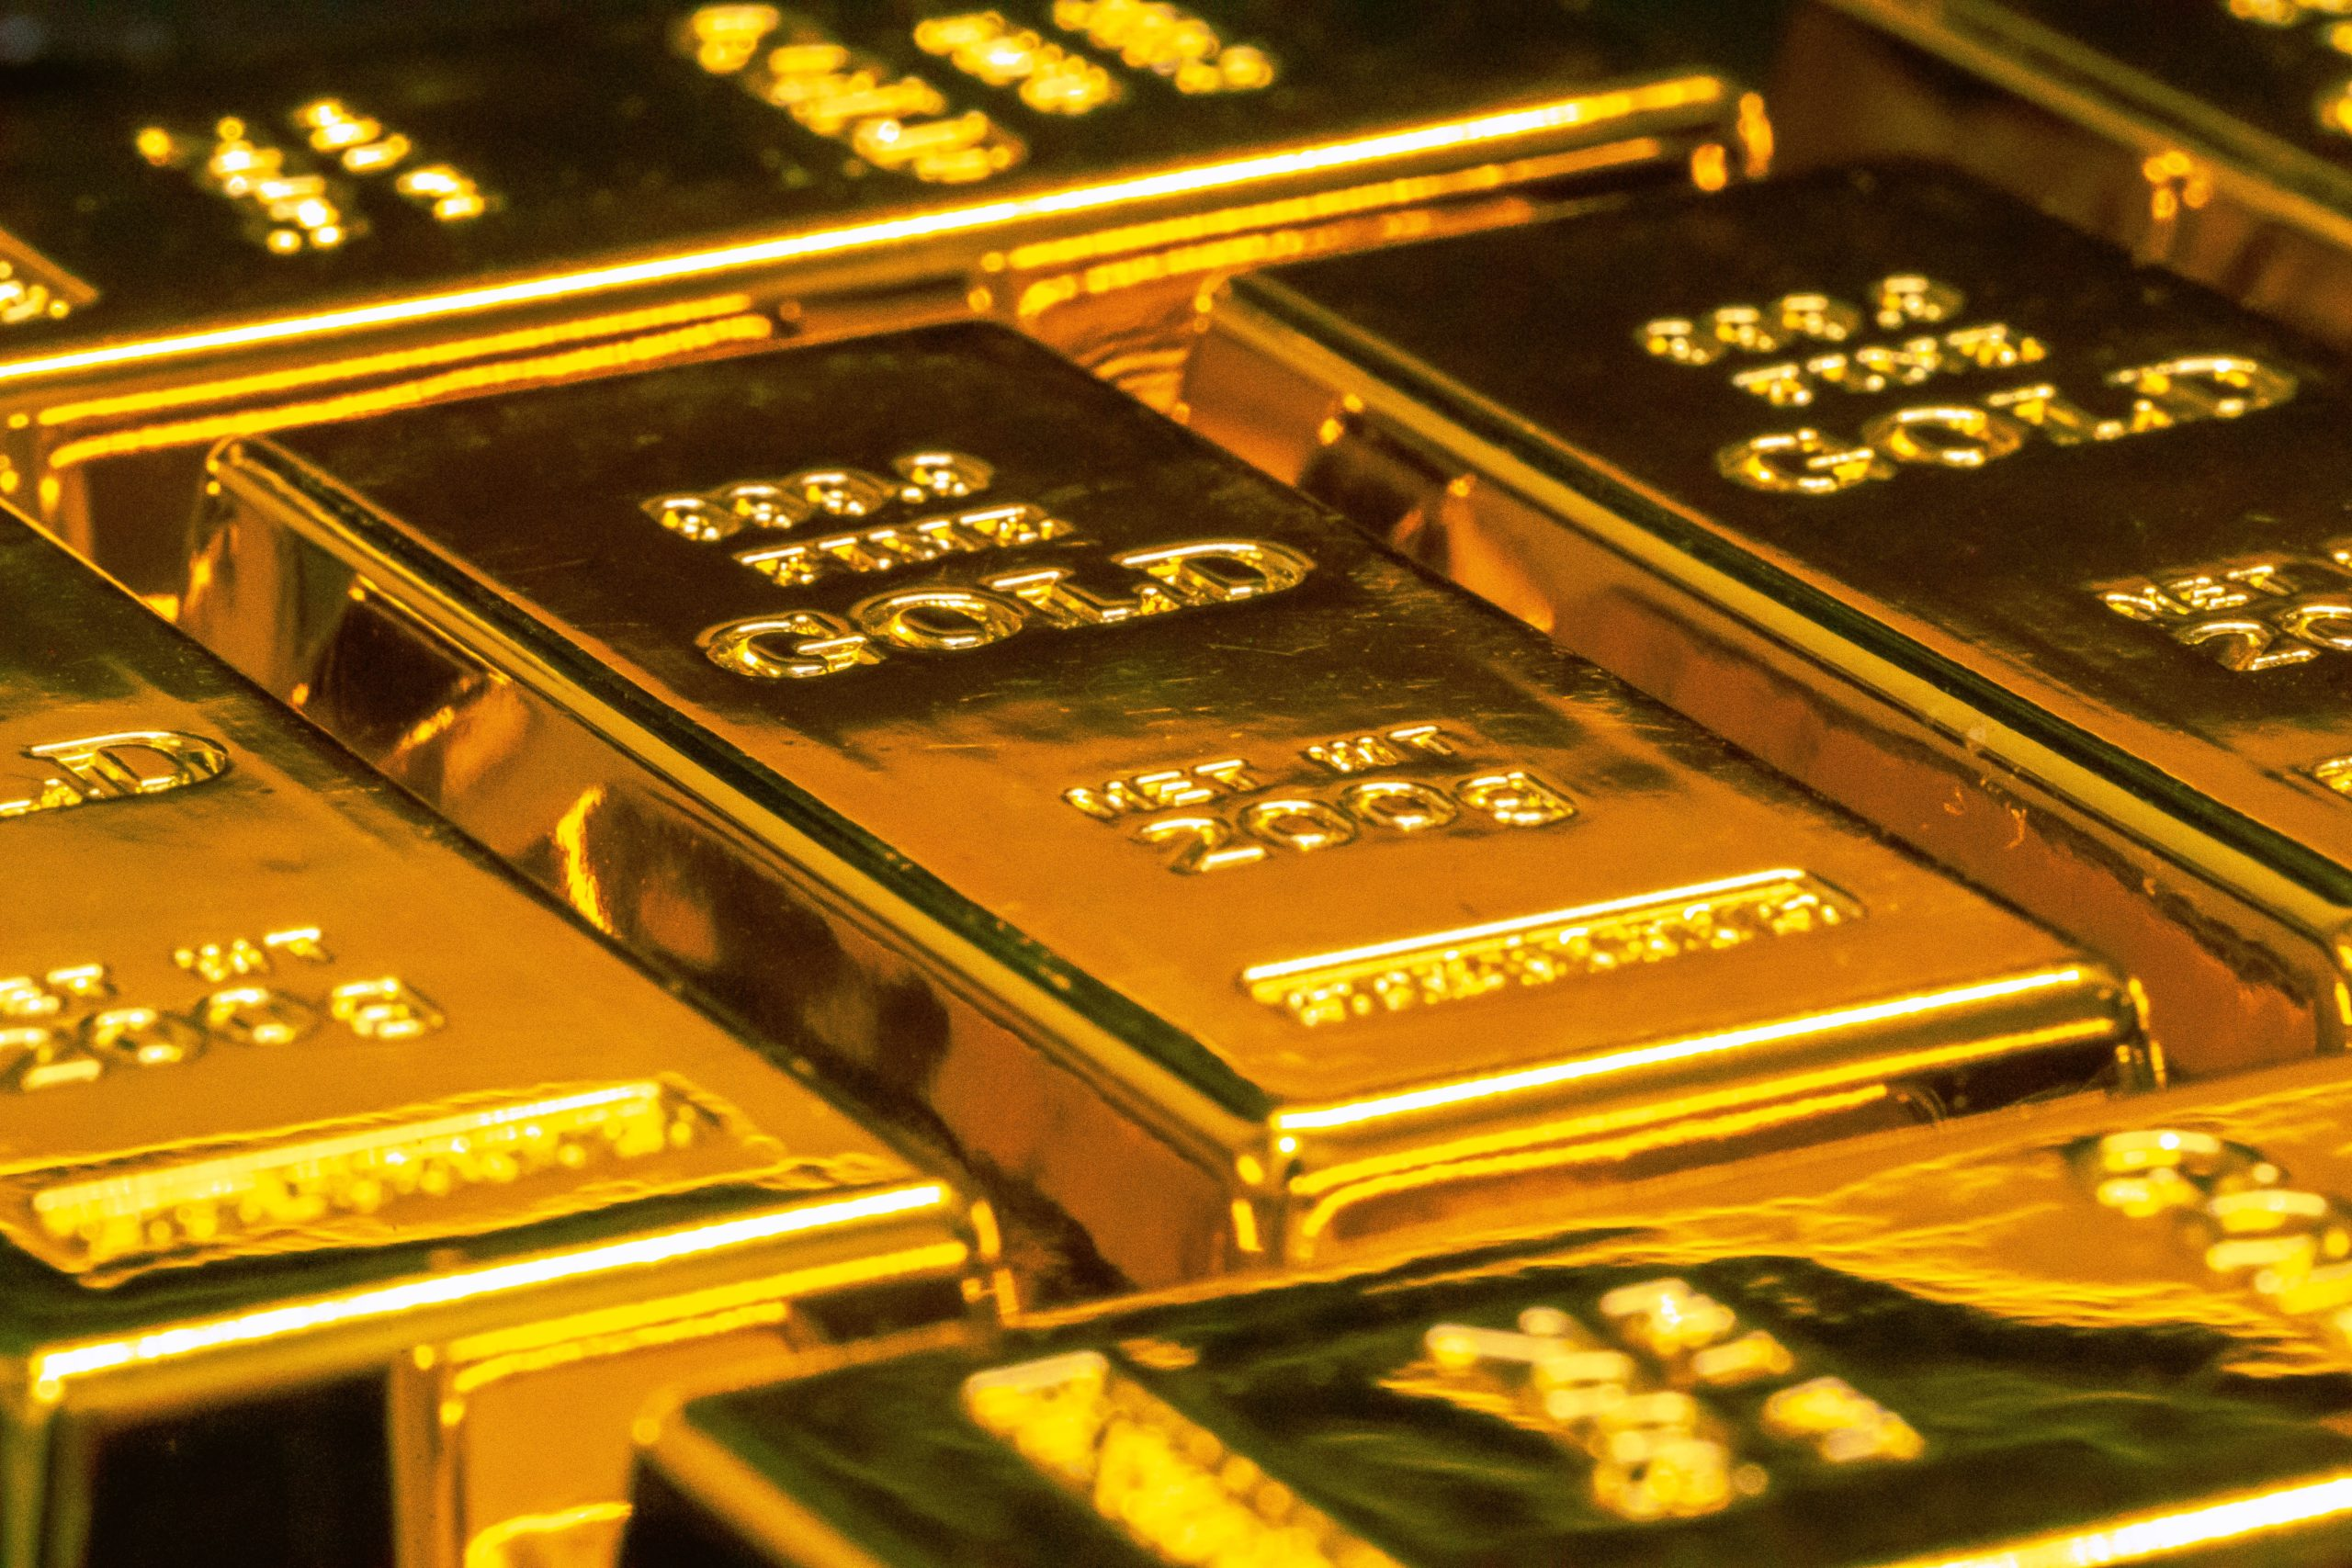 Driekwart pensioenfondsen wil meer goud in portfolio